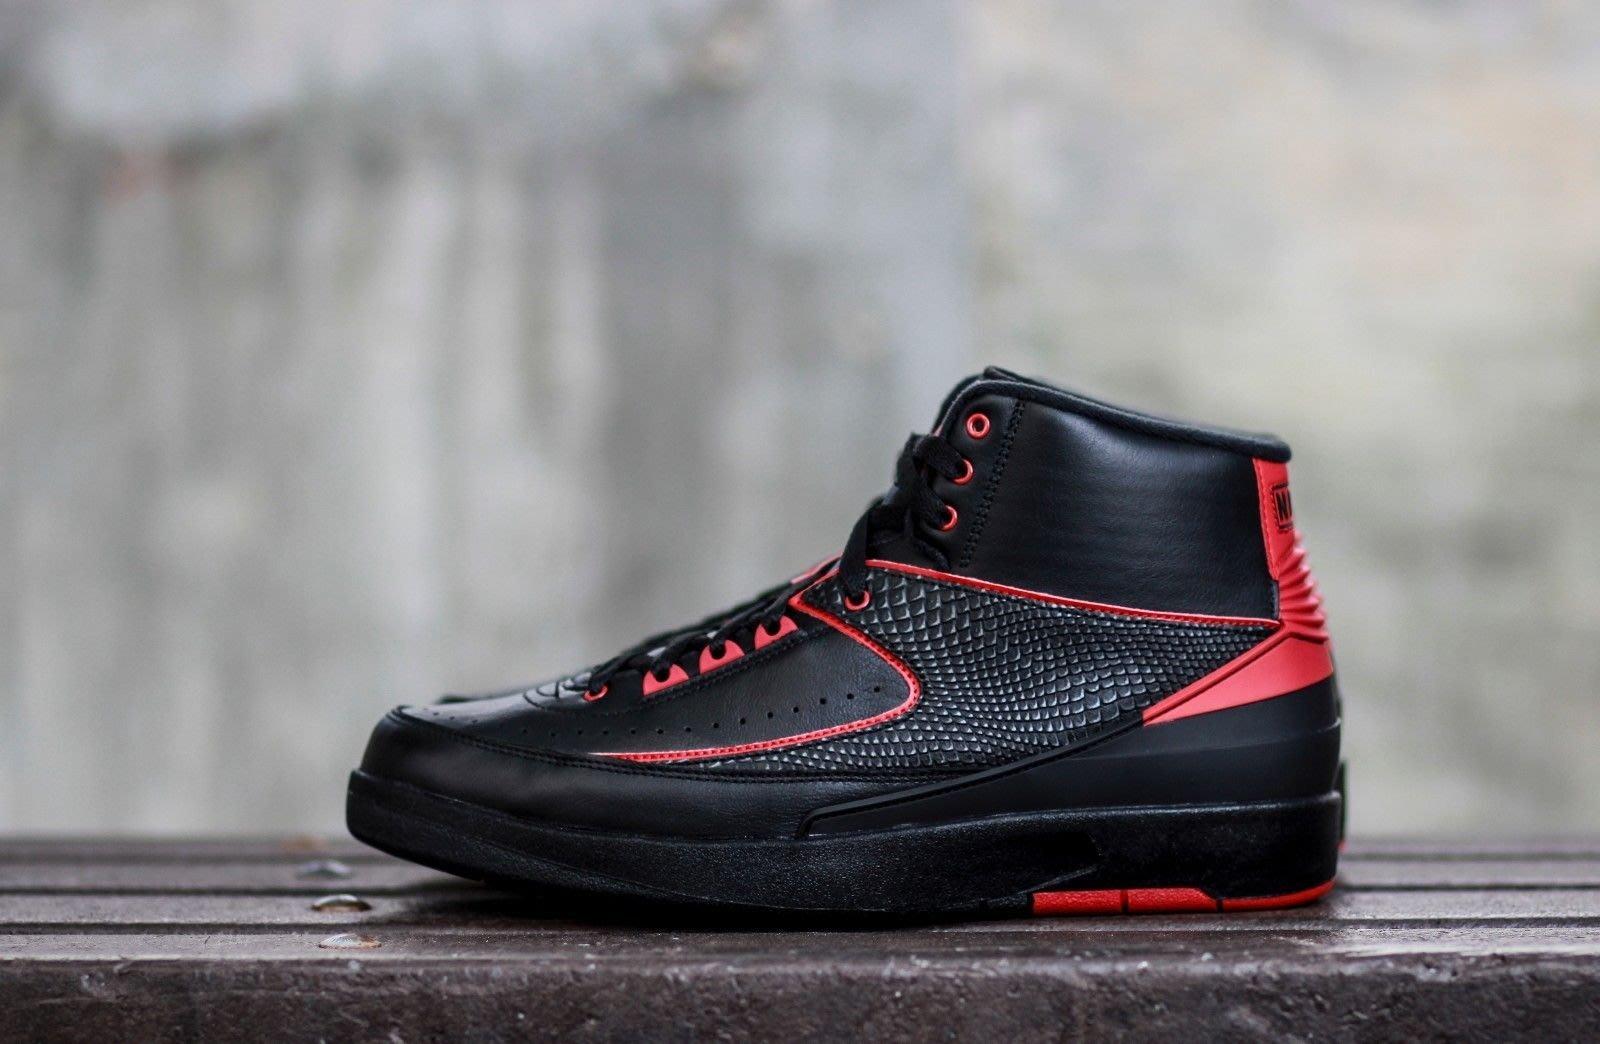 Nike Air Jordan 2 retro Alternate '87 834274-001喬丹AJ-2公牛黑紅蛇紋